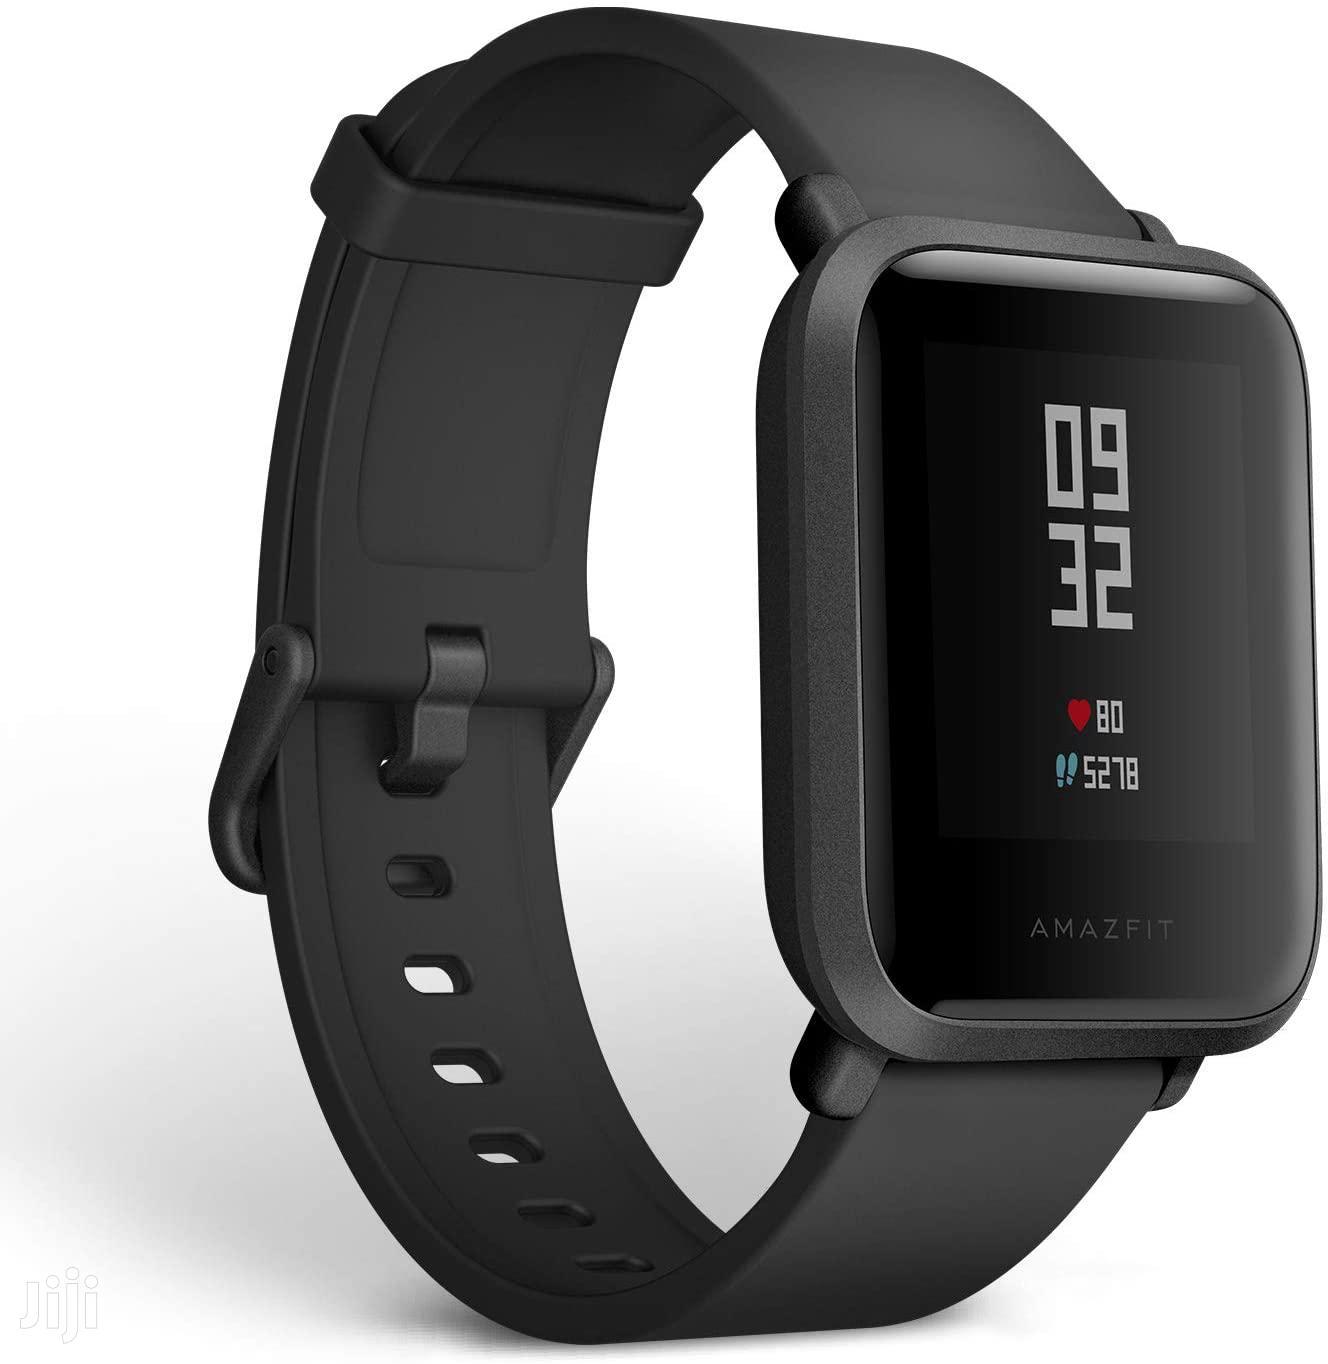 Amazfit Bip Smart Watch Black | Smart Watches & Trackers for sale in Ilala, Dar es Salaam, Tanzania